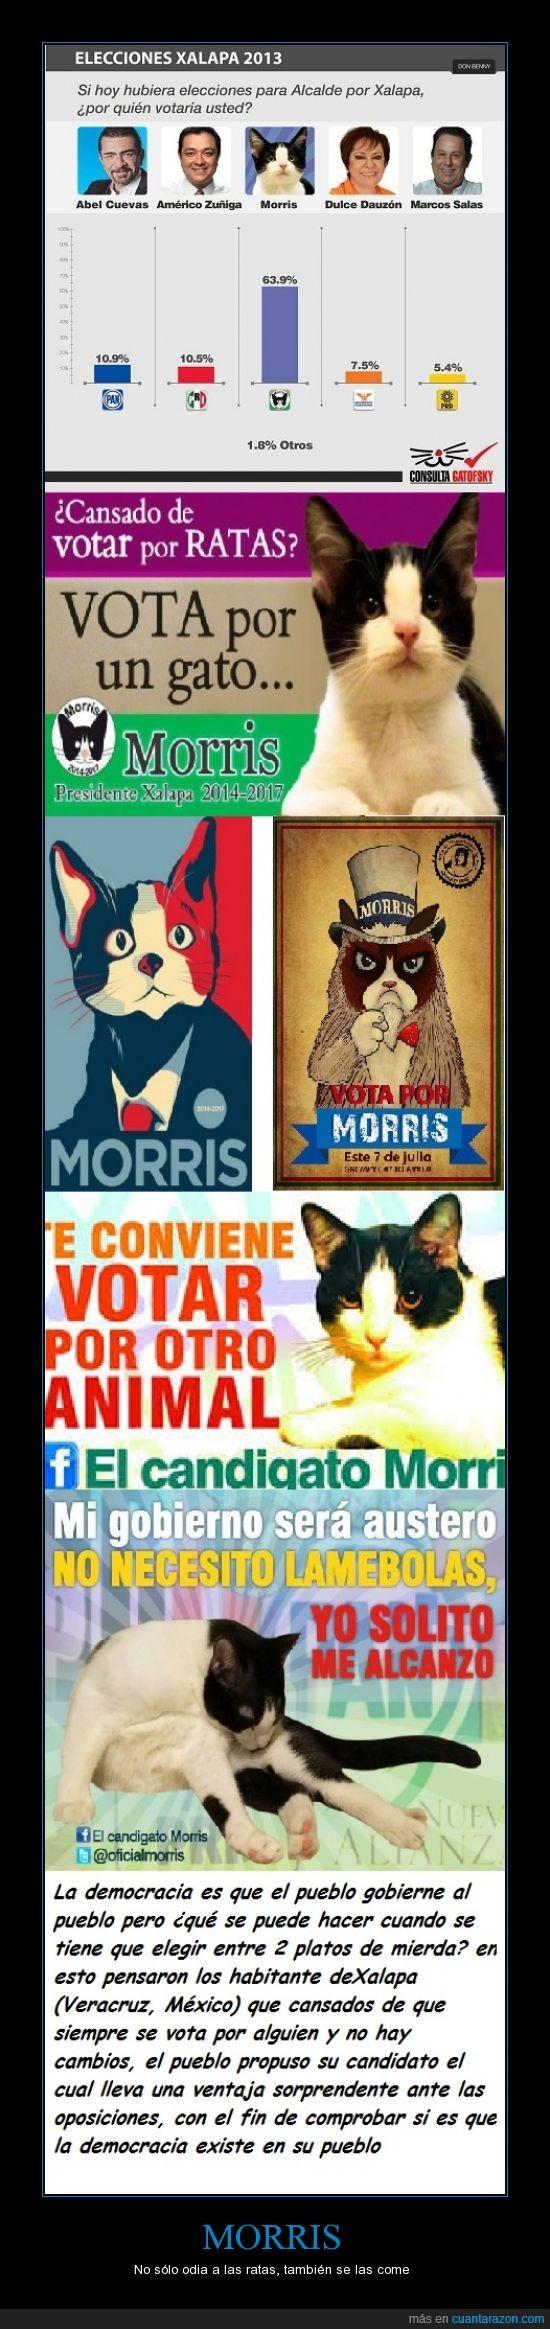 democracia,gato,morris,politica,votar